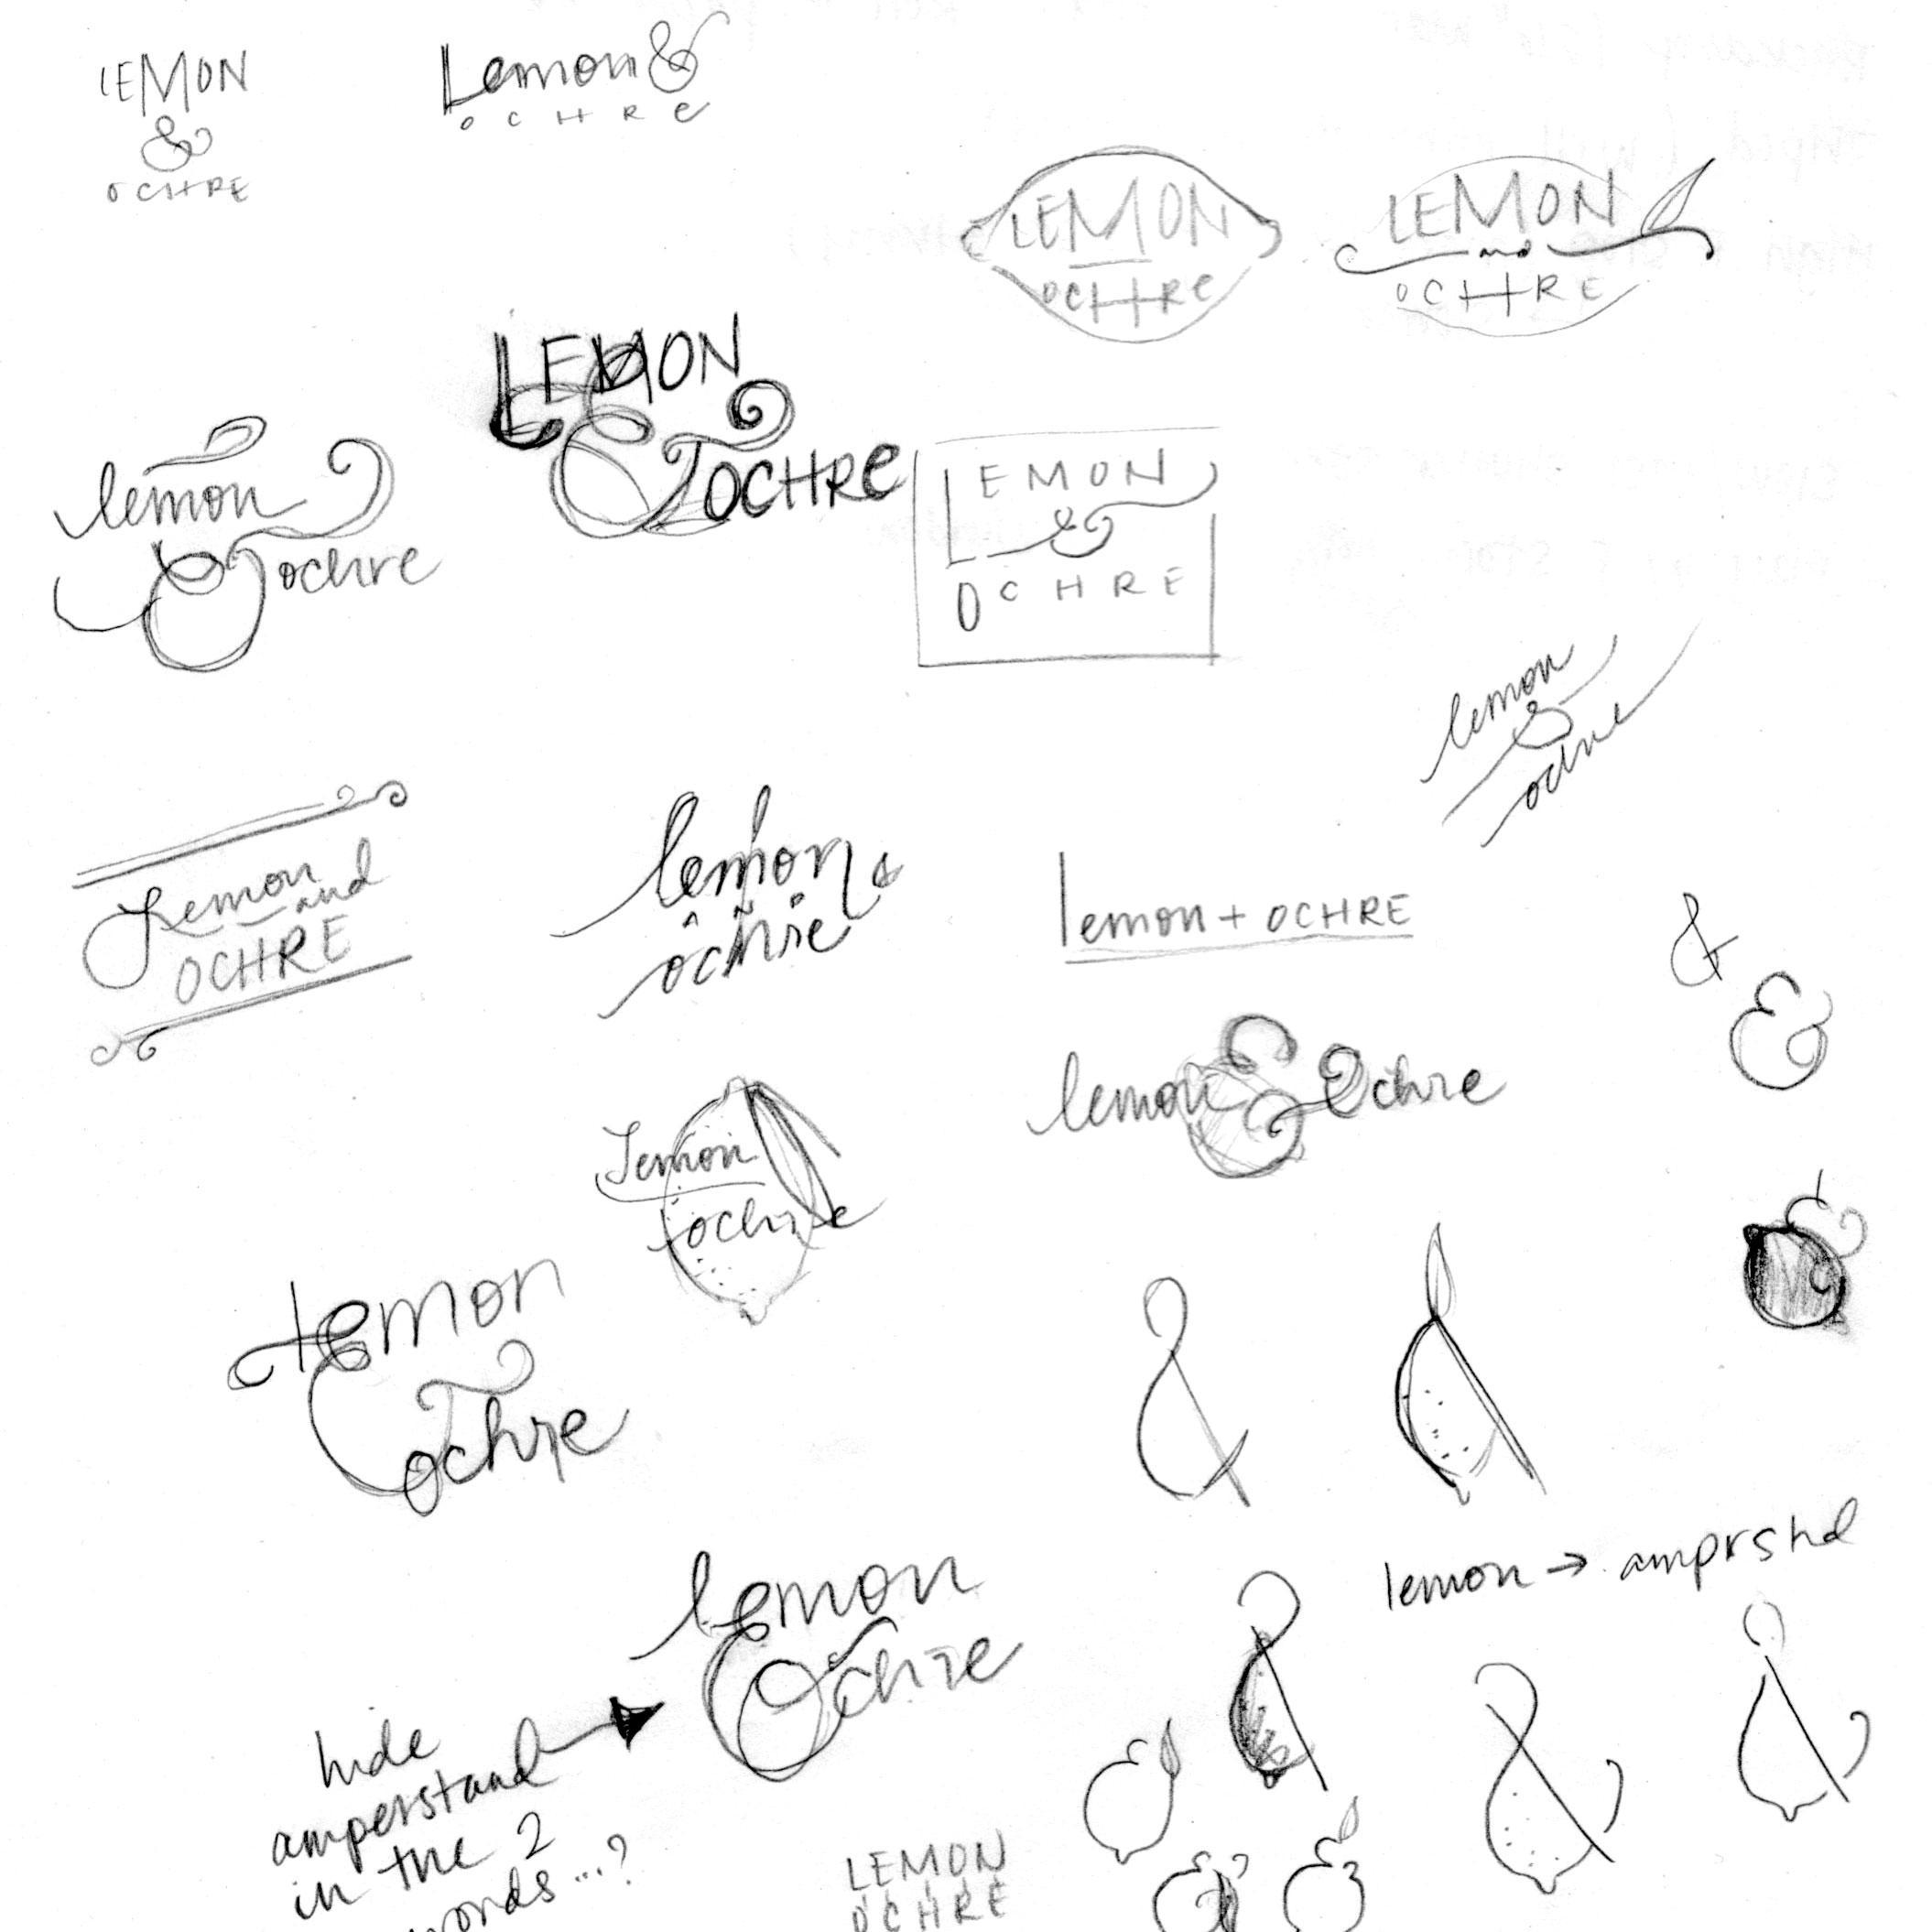 Lemon & Ochre Logo - image 1 - student project